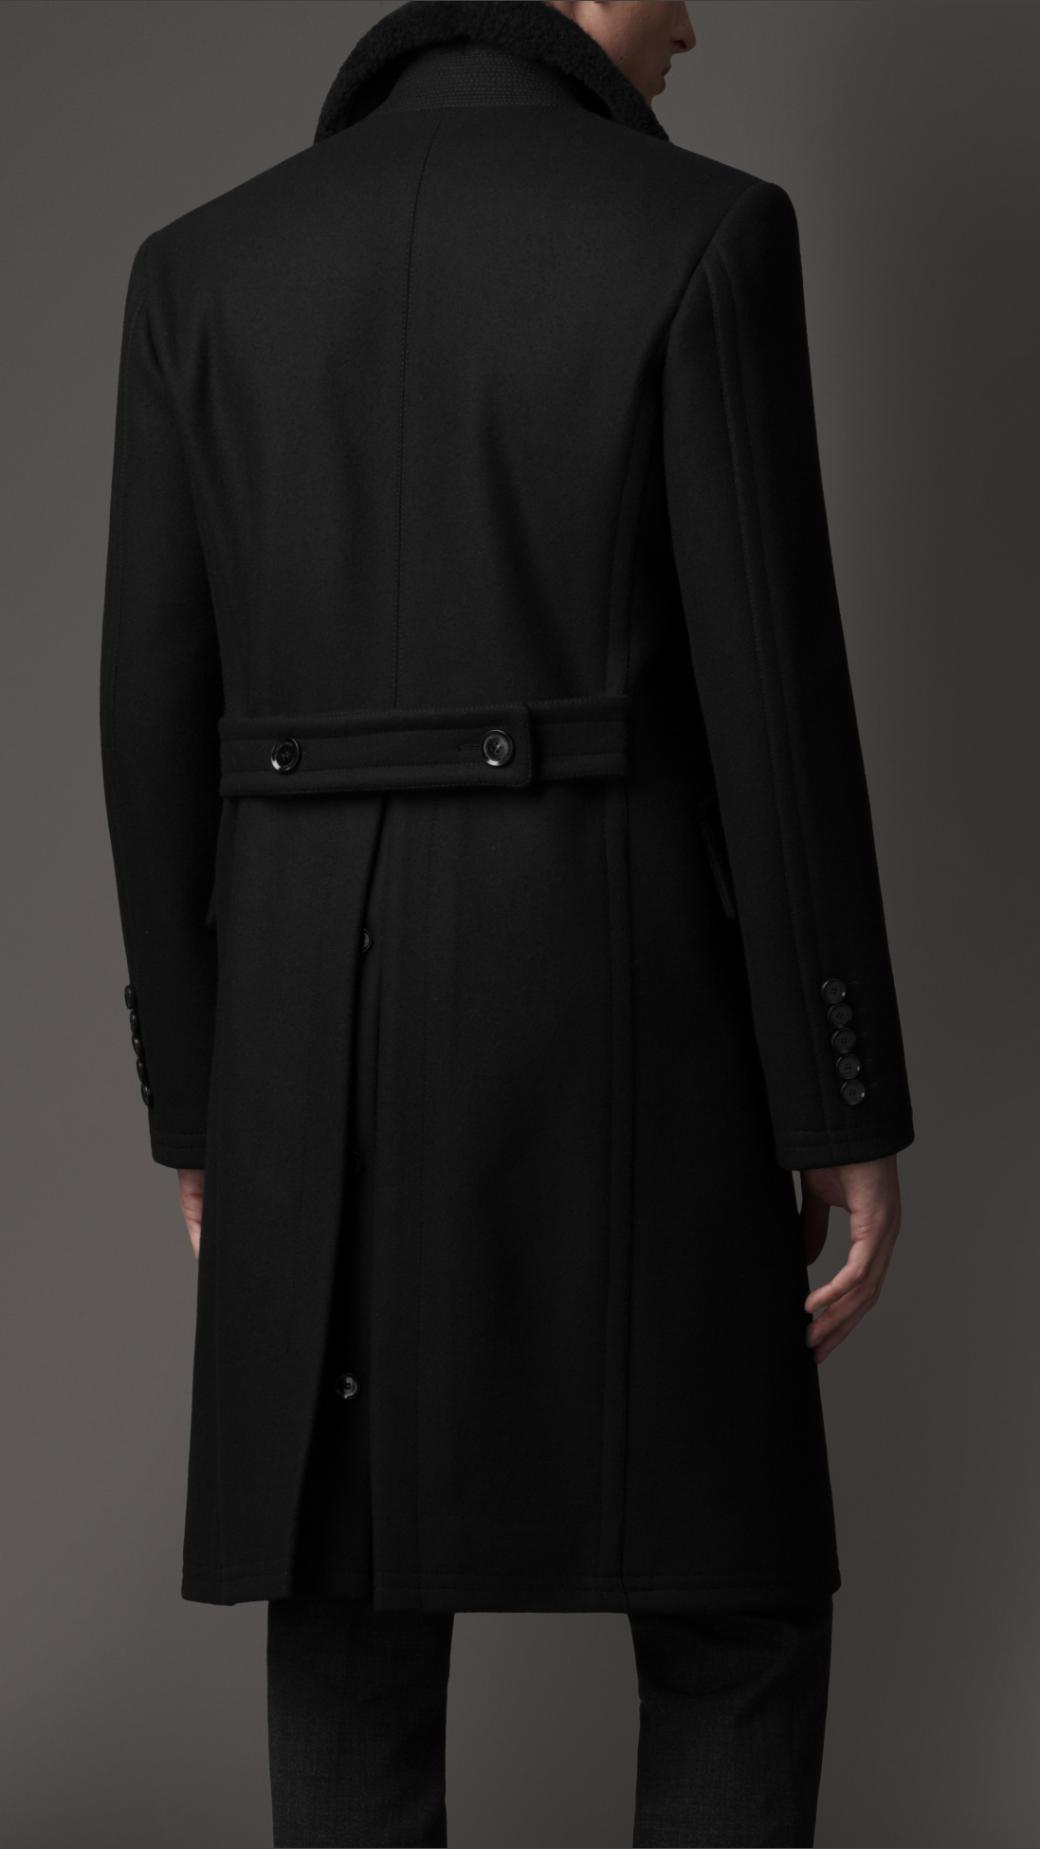 Lyst Burberry Virgin Wool Chesterfield Coat In Black For Men